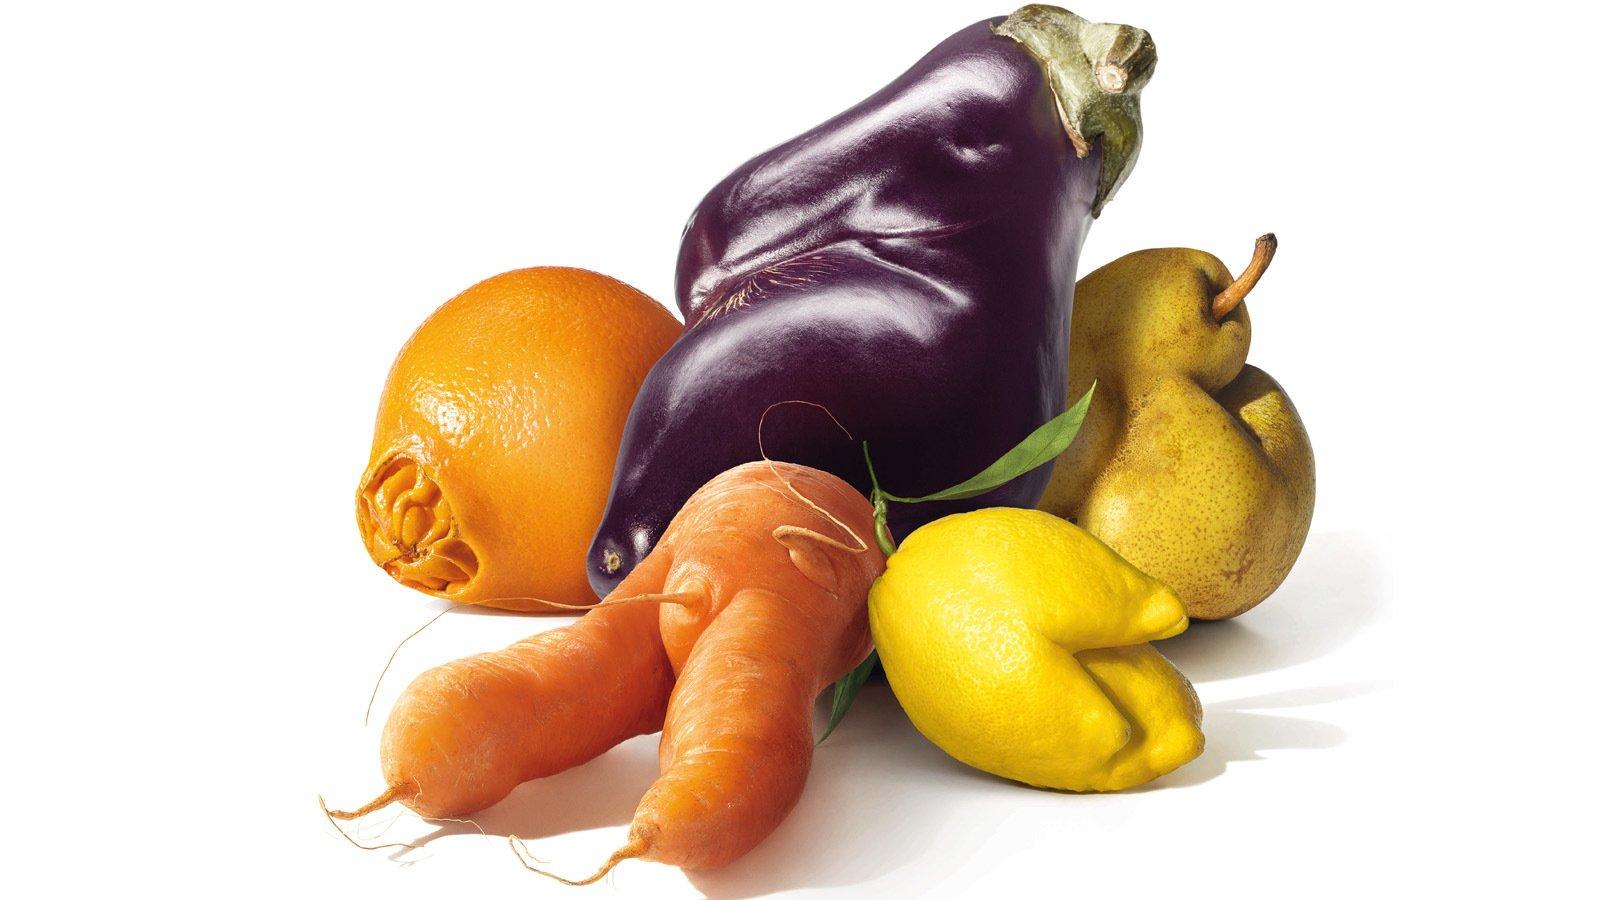 frutta e verdura imperfetta